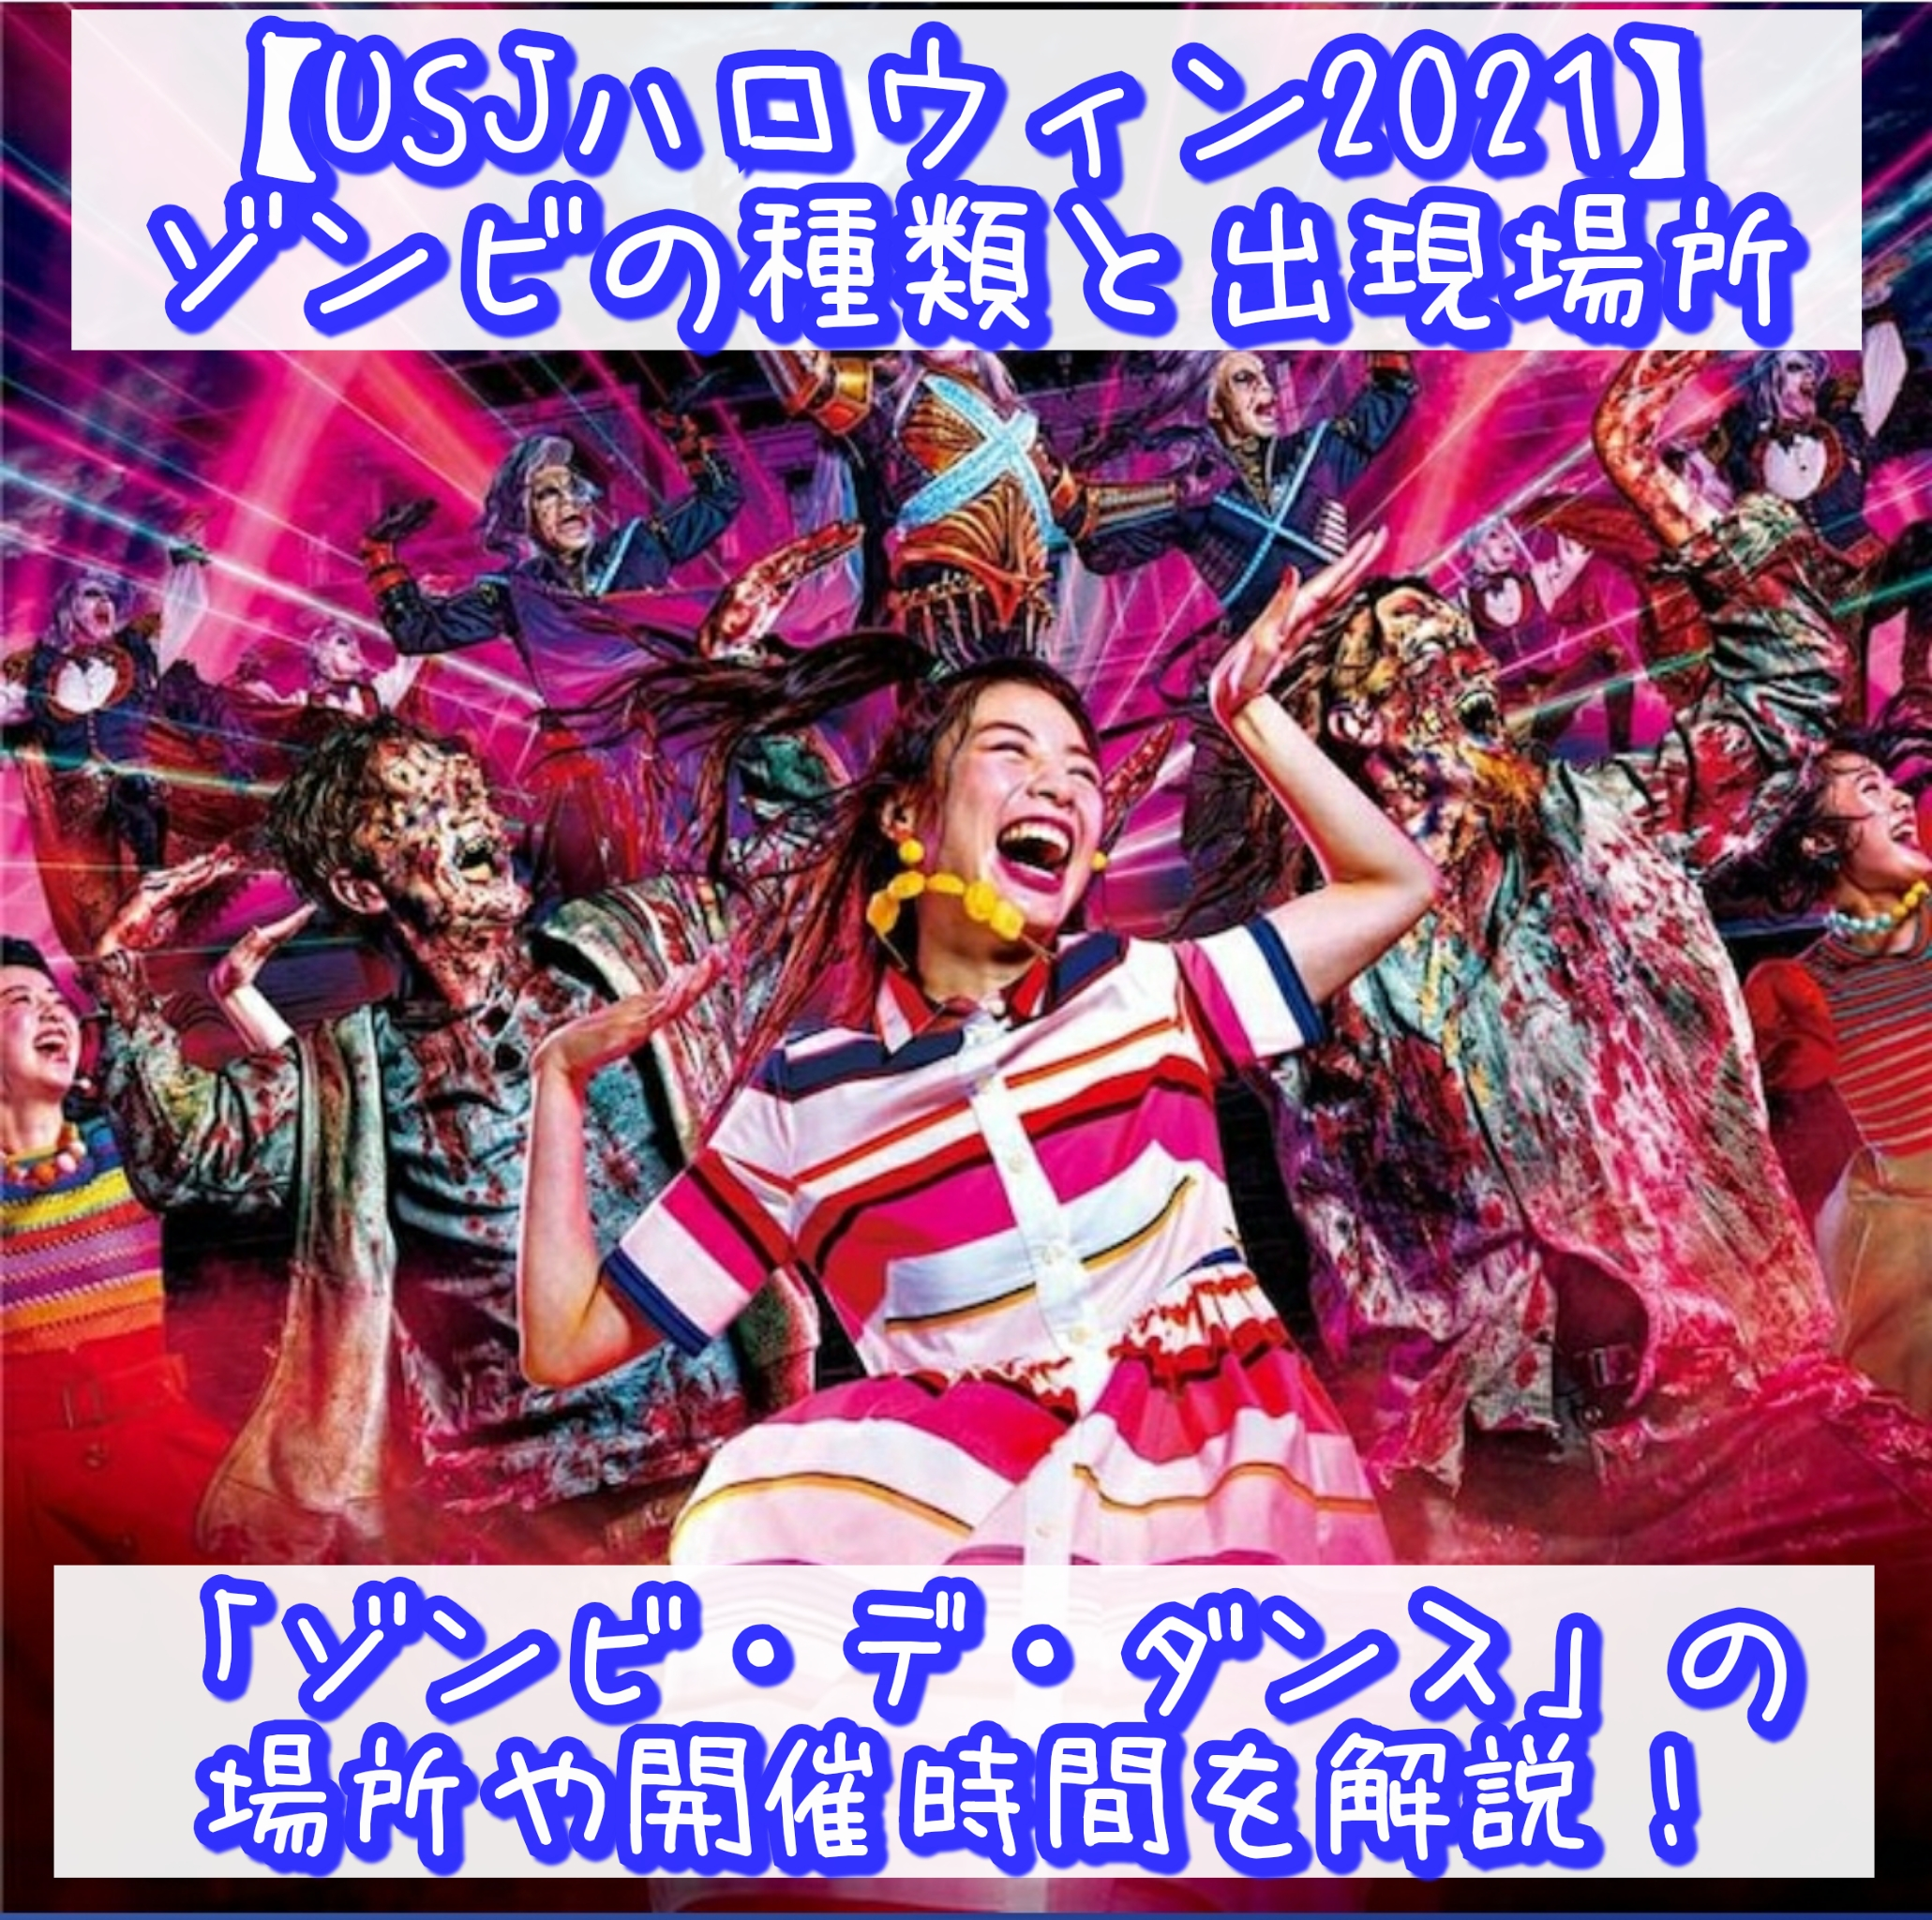 【USJハロウィン2021】ゾンビの種類と出現場所「ゾンビ・デ・ダンス」の場所や開催時間を解説!